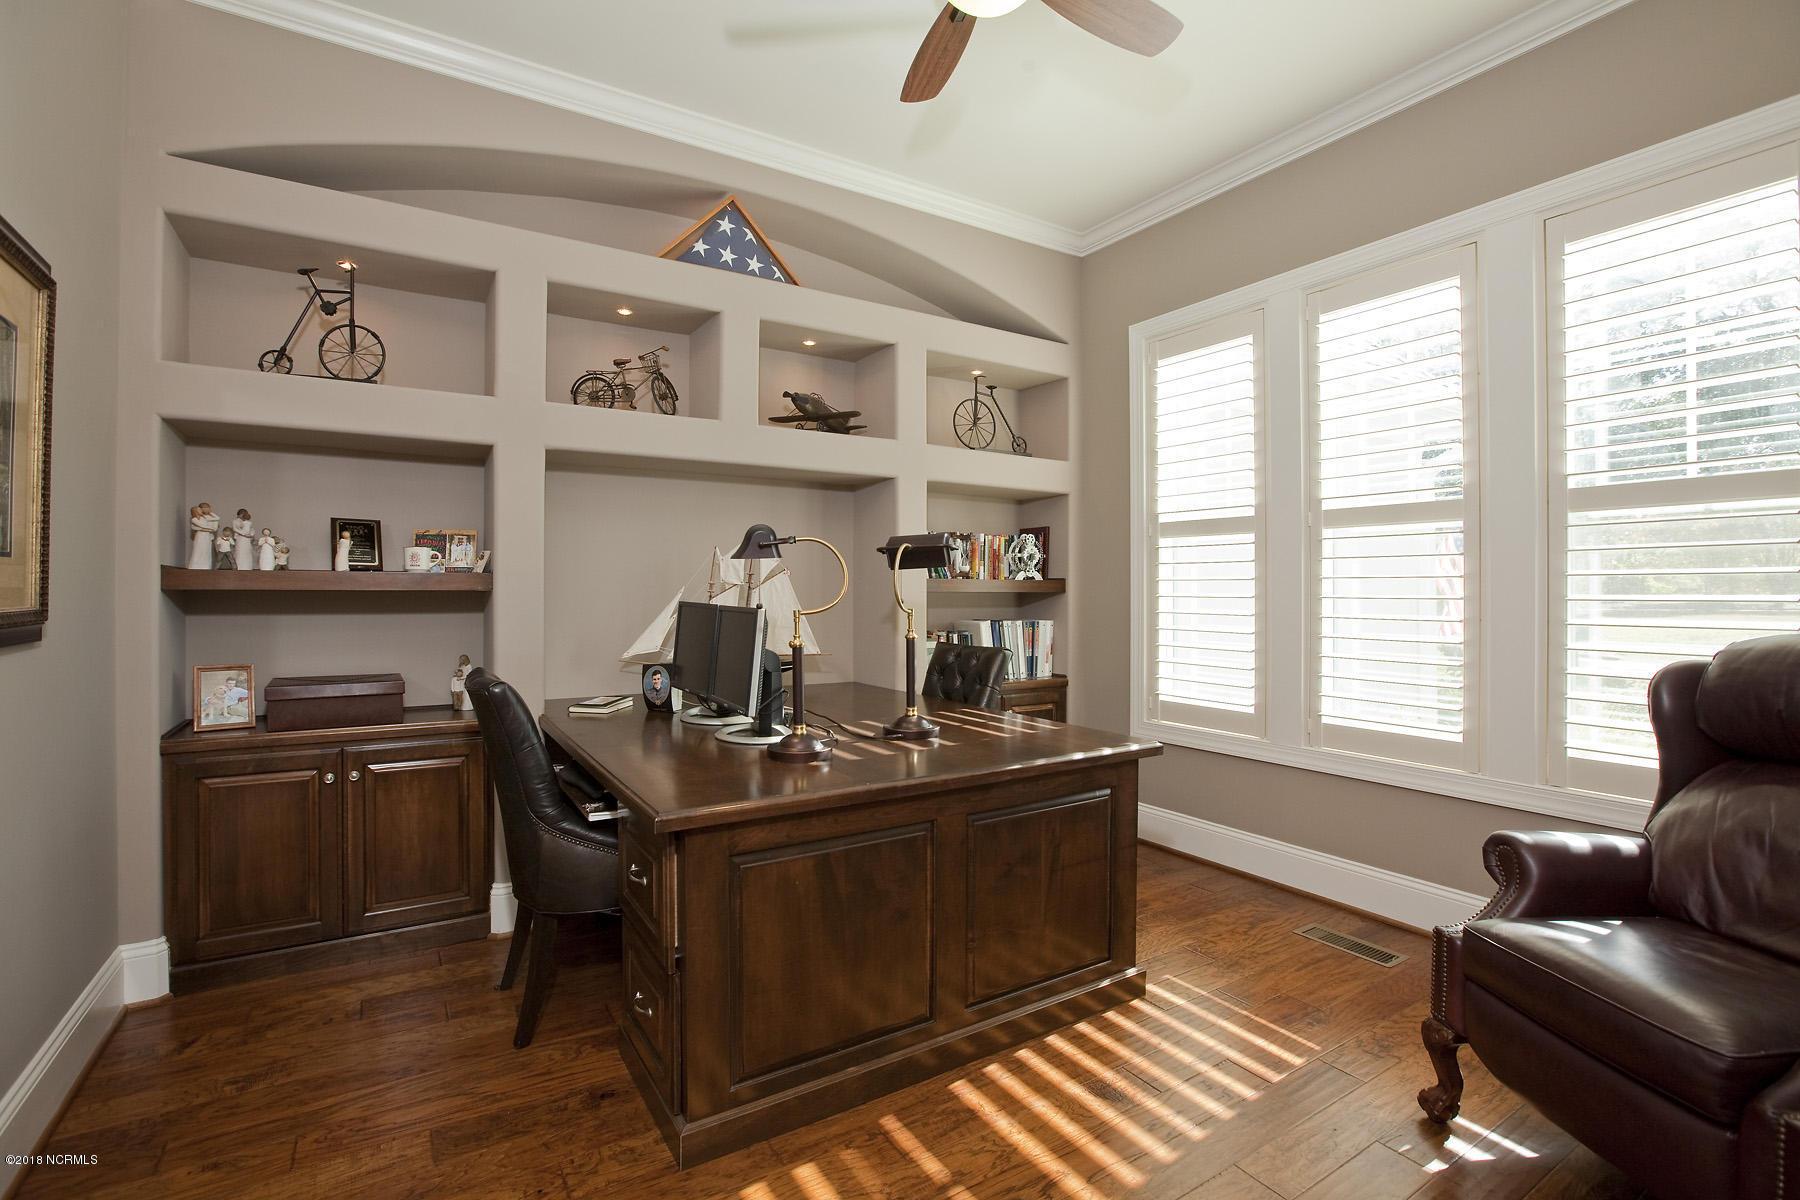 5416 Aventuras Drive, Wilmington, North Carolina 28409, 5 Bedrooms Bedrooms, 13 Rooms Rooms,4 BathroomsBathrooms,Residential,For Sale,Aventuras,100142726